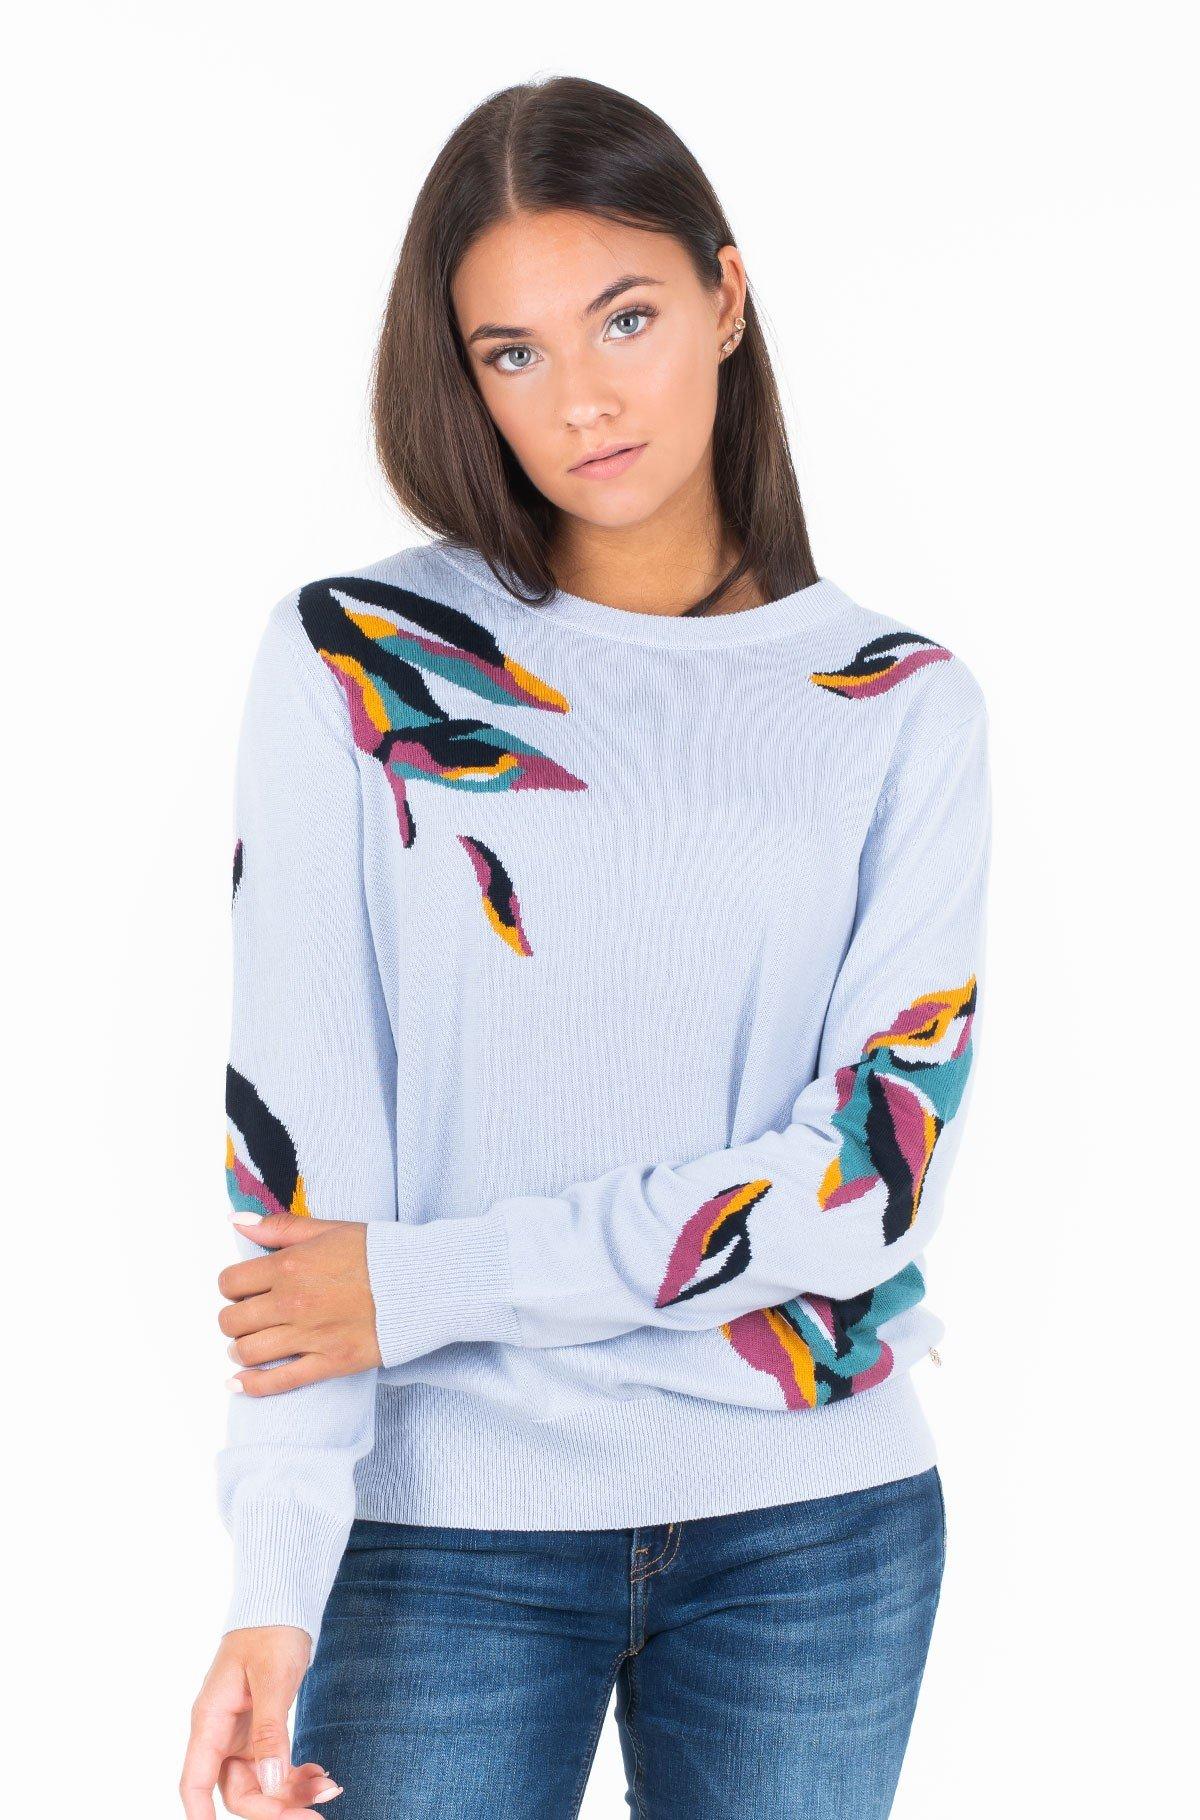 Sweater 1013458-full-1